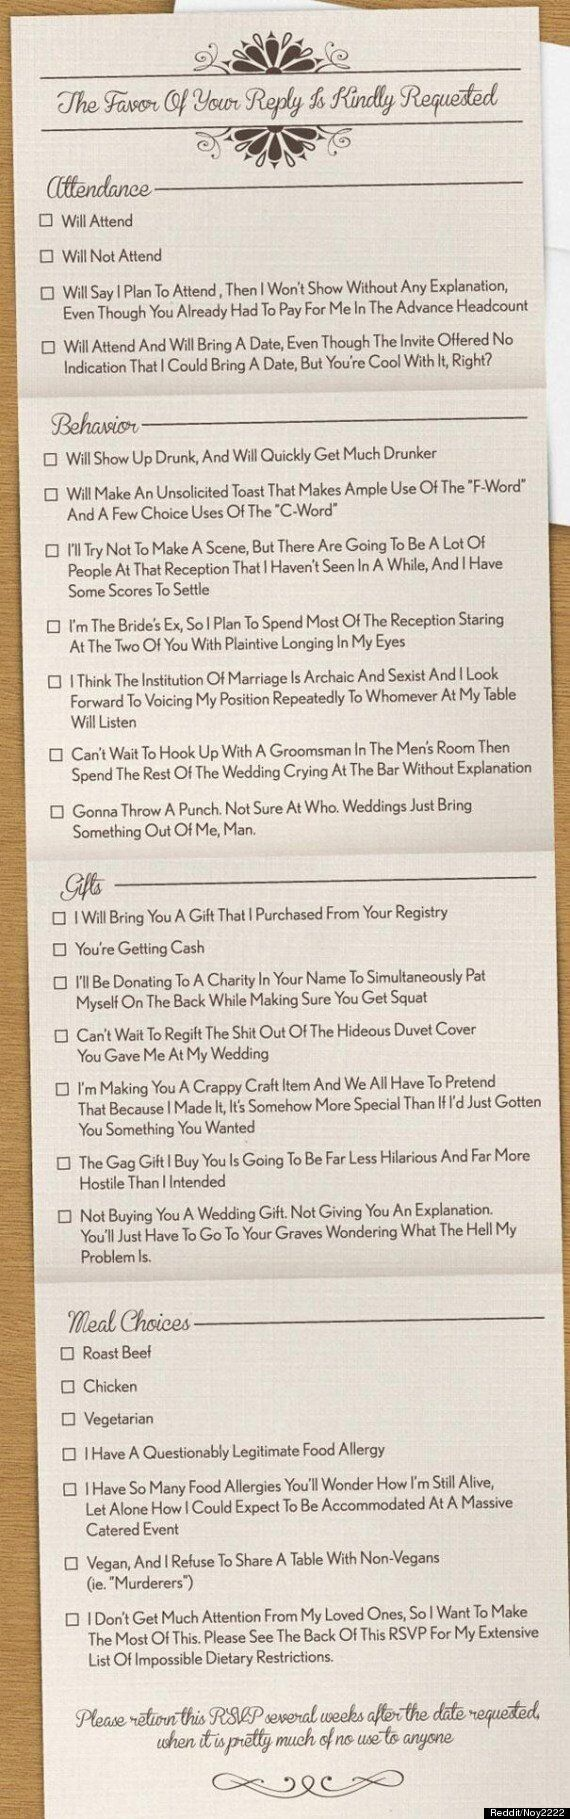 At Last, An Honest Wedding